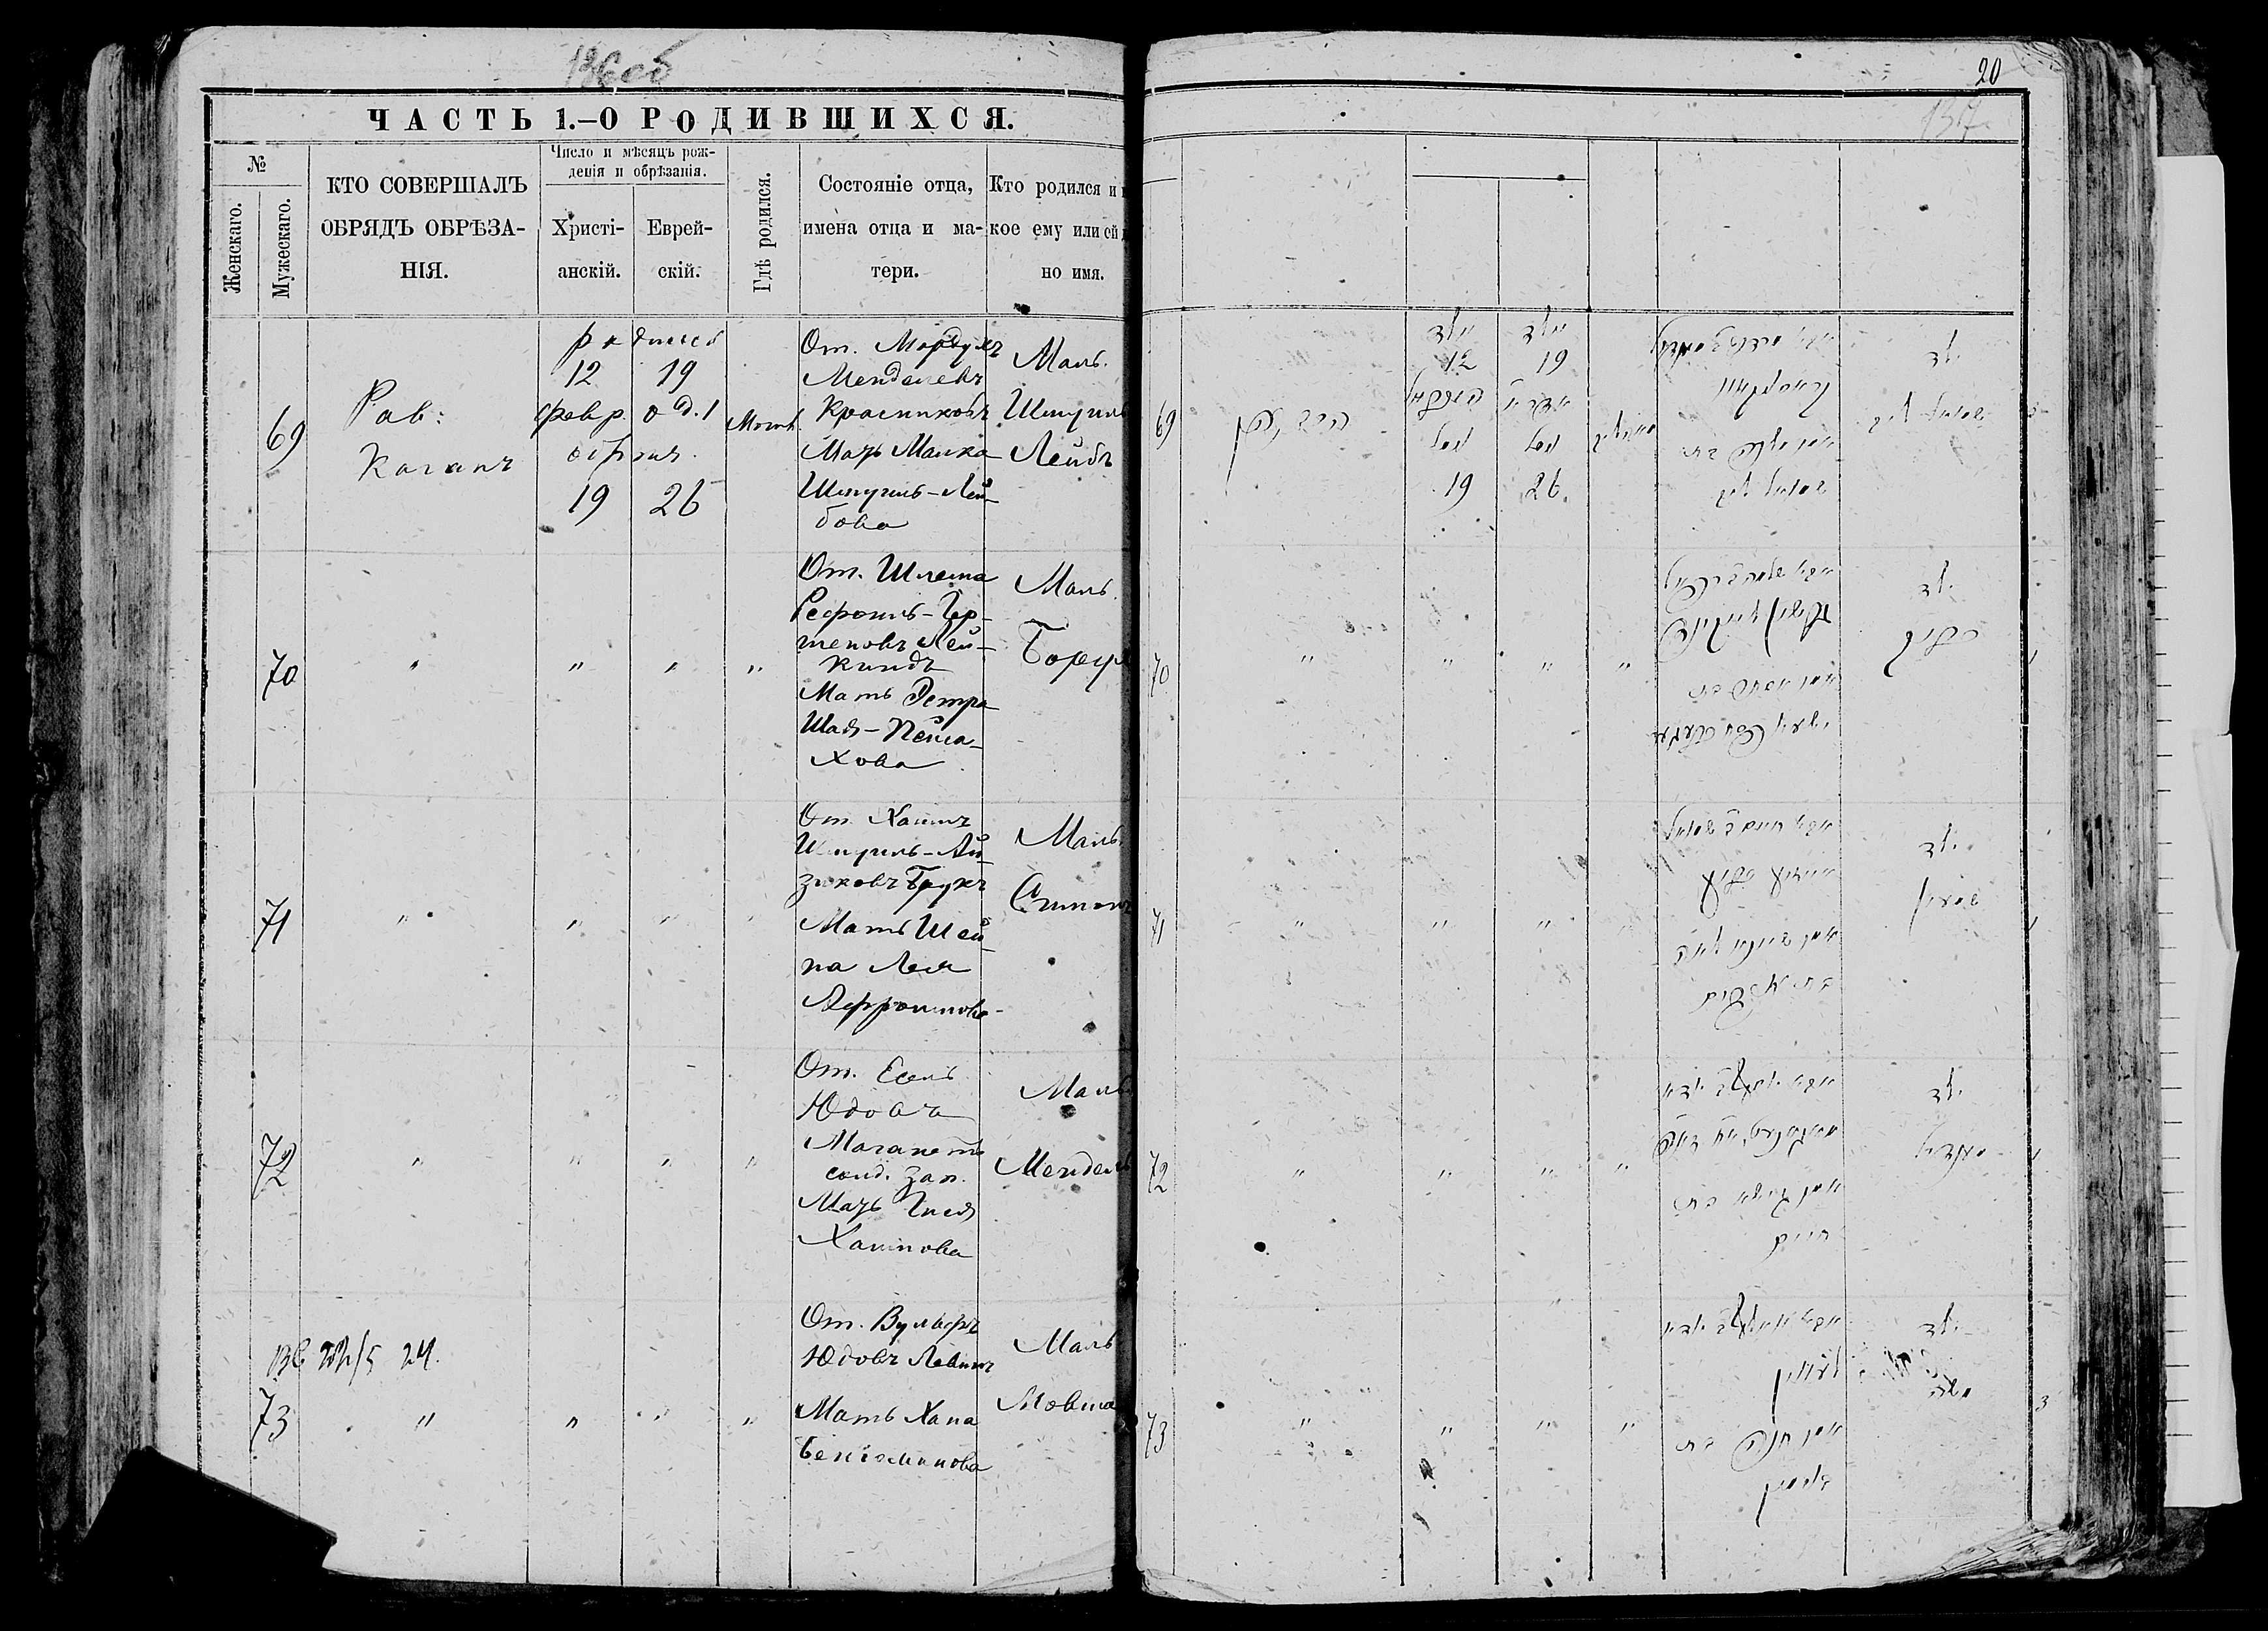 Шмуиль-Лейб Красников 12 февраля 1886, запись 69, пленка 007766483, снимок 513